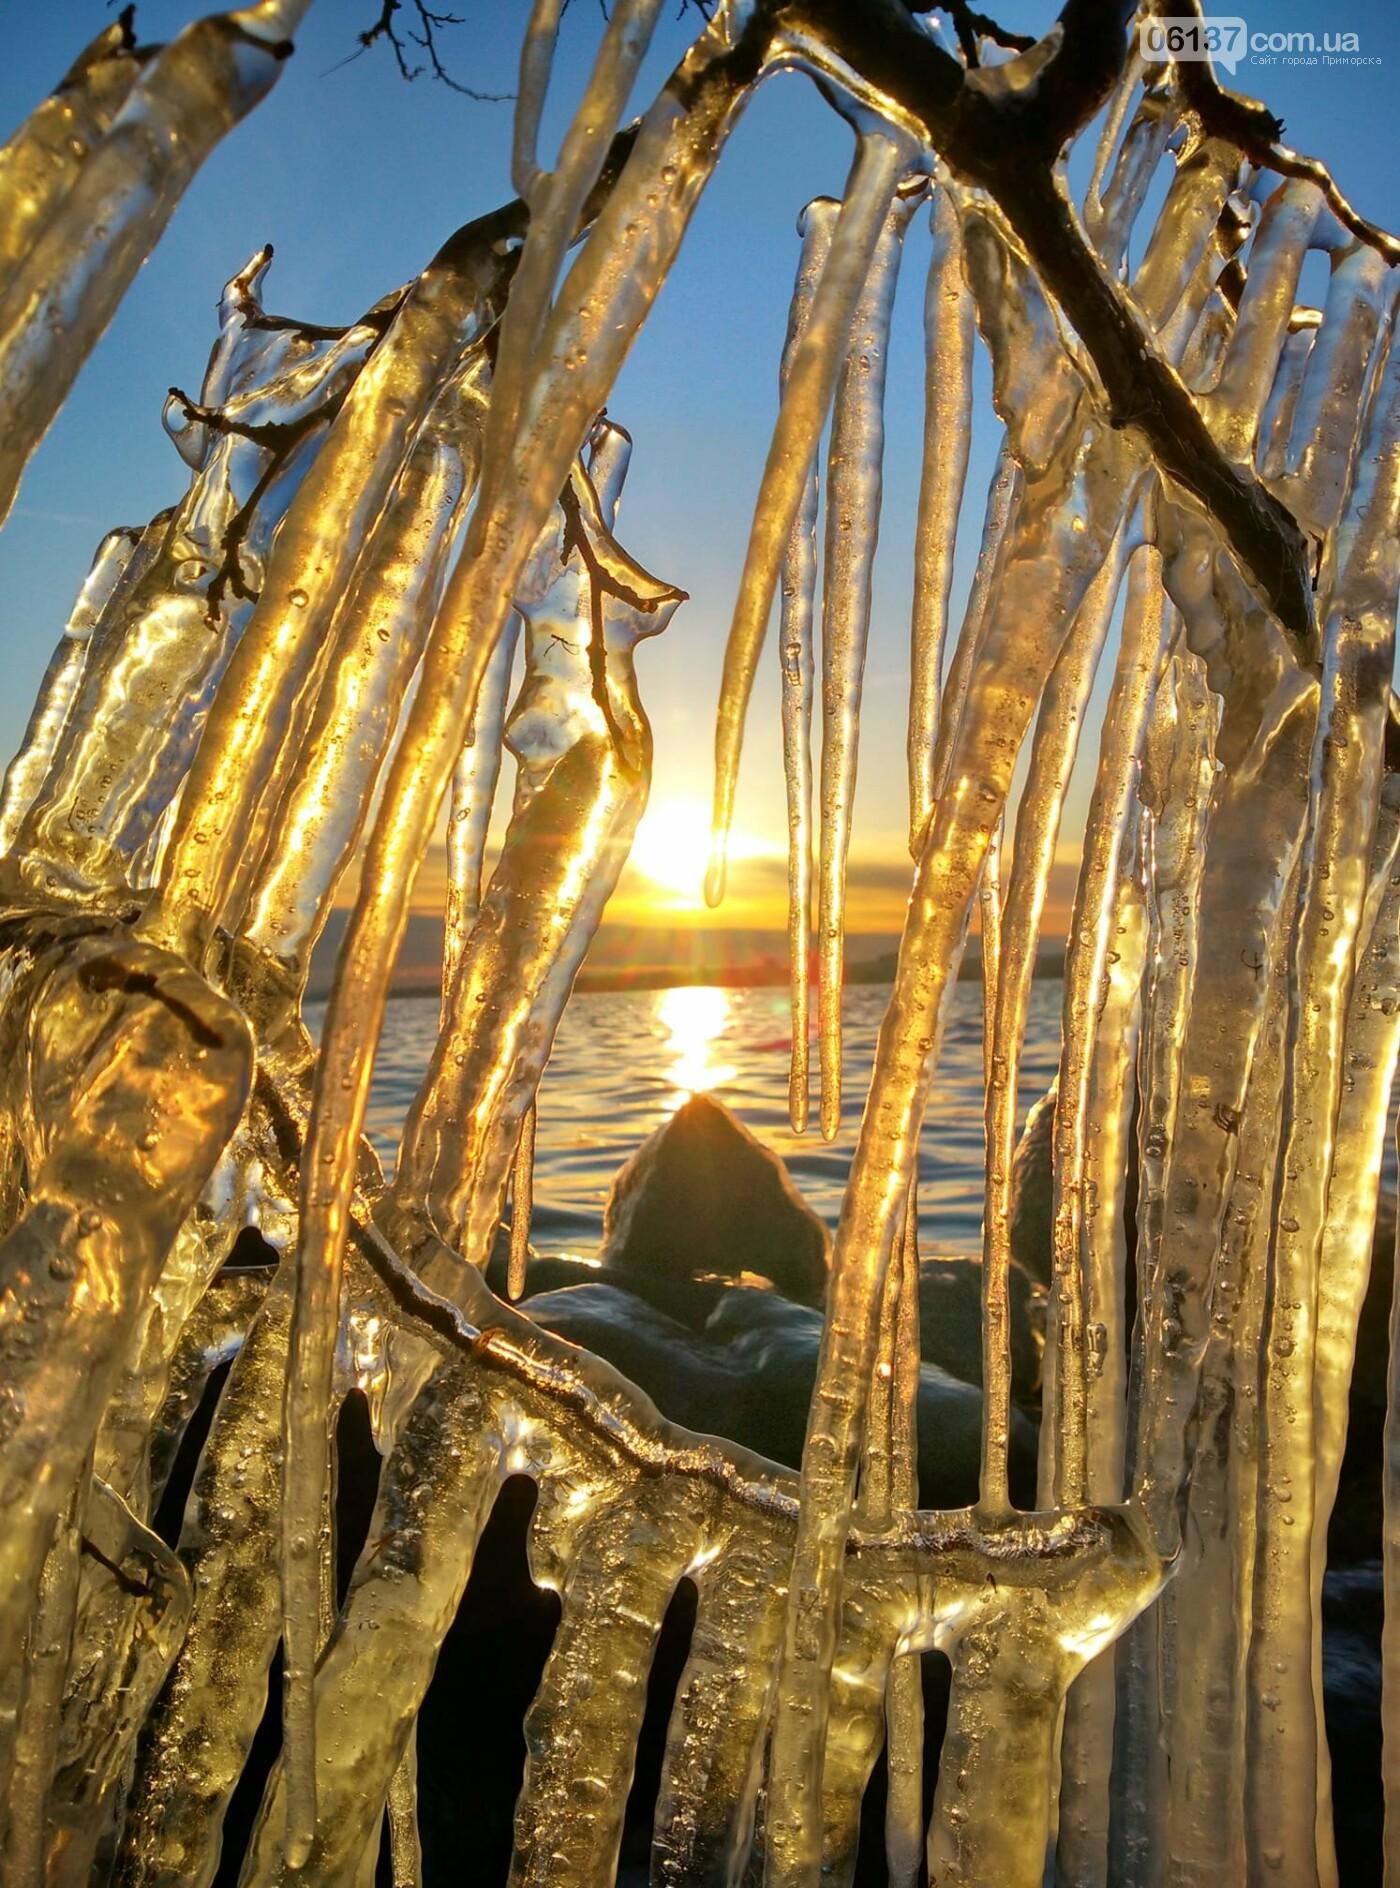 Солнце и лед: рассвет и закат на выходных в Запорожье. Фото  , фото-1